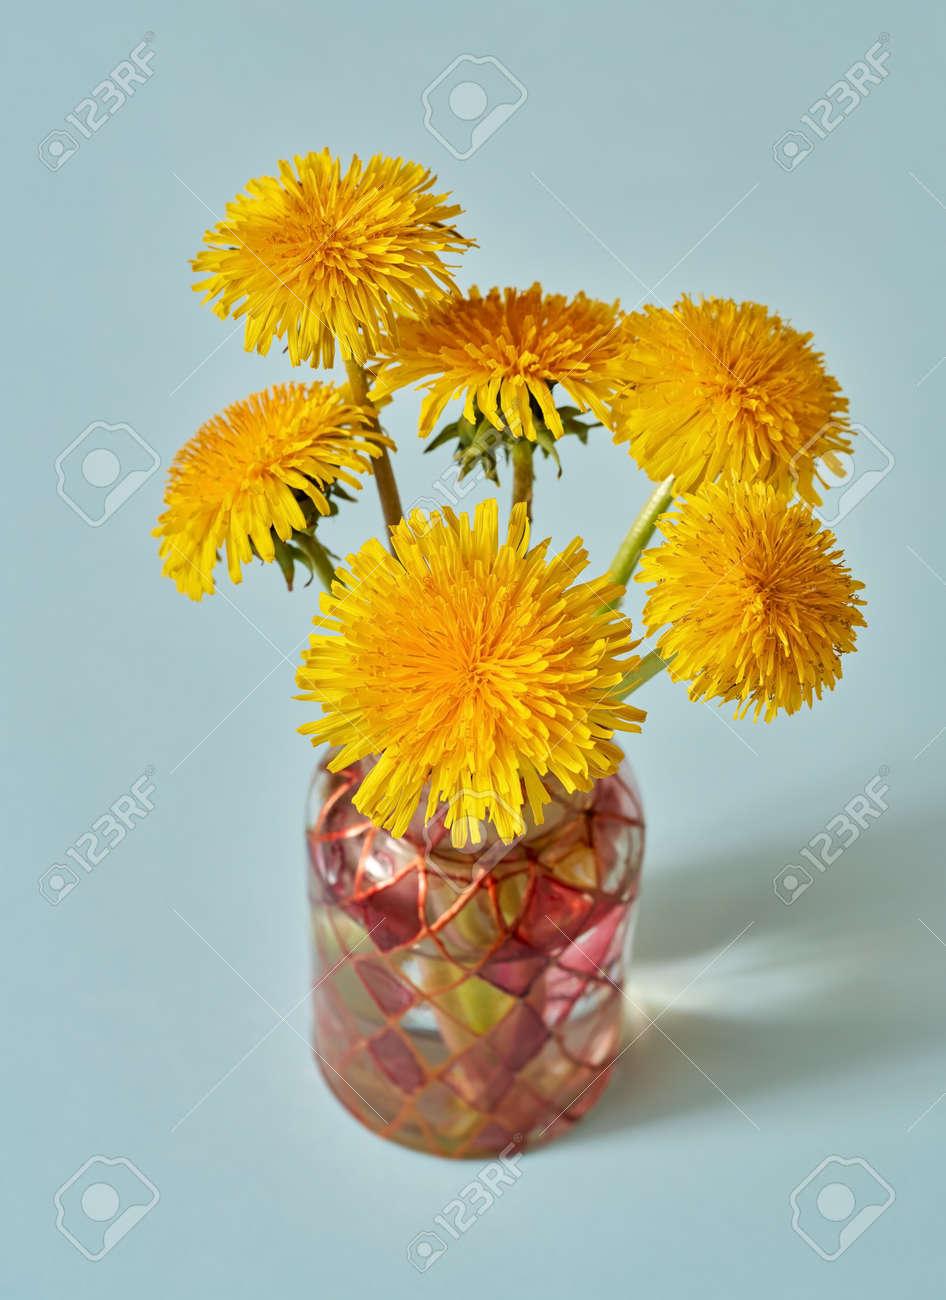 Fresh dandelion flowers in a vase on blue pastel background - 169337994